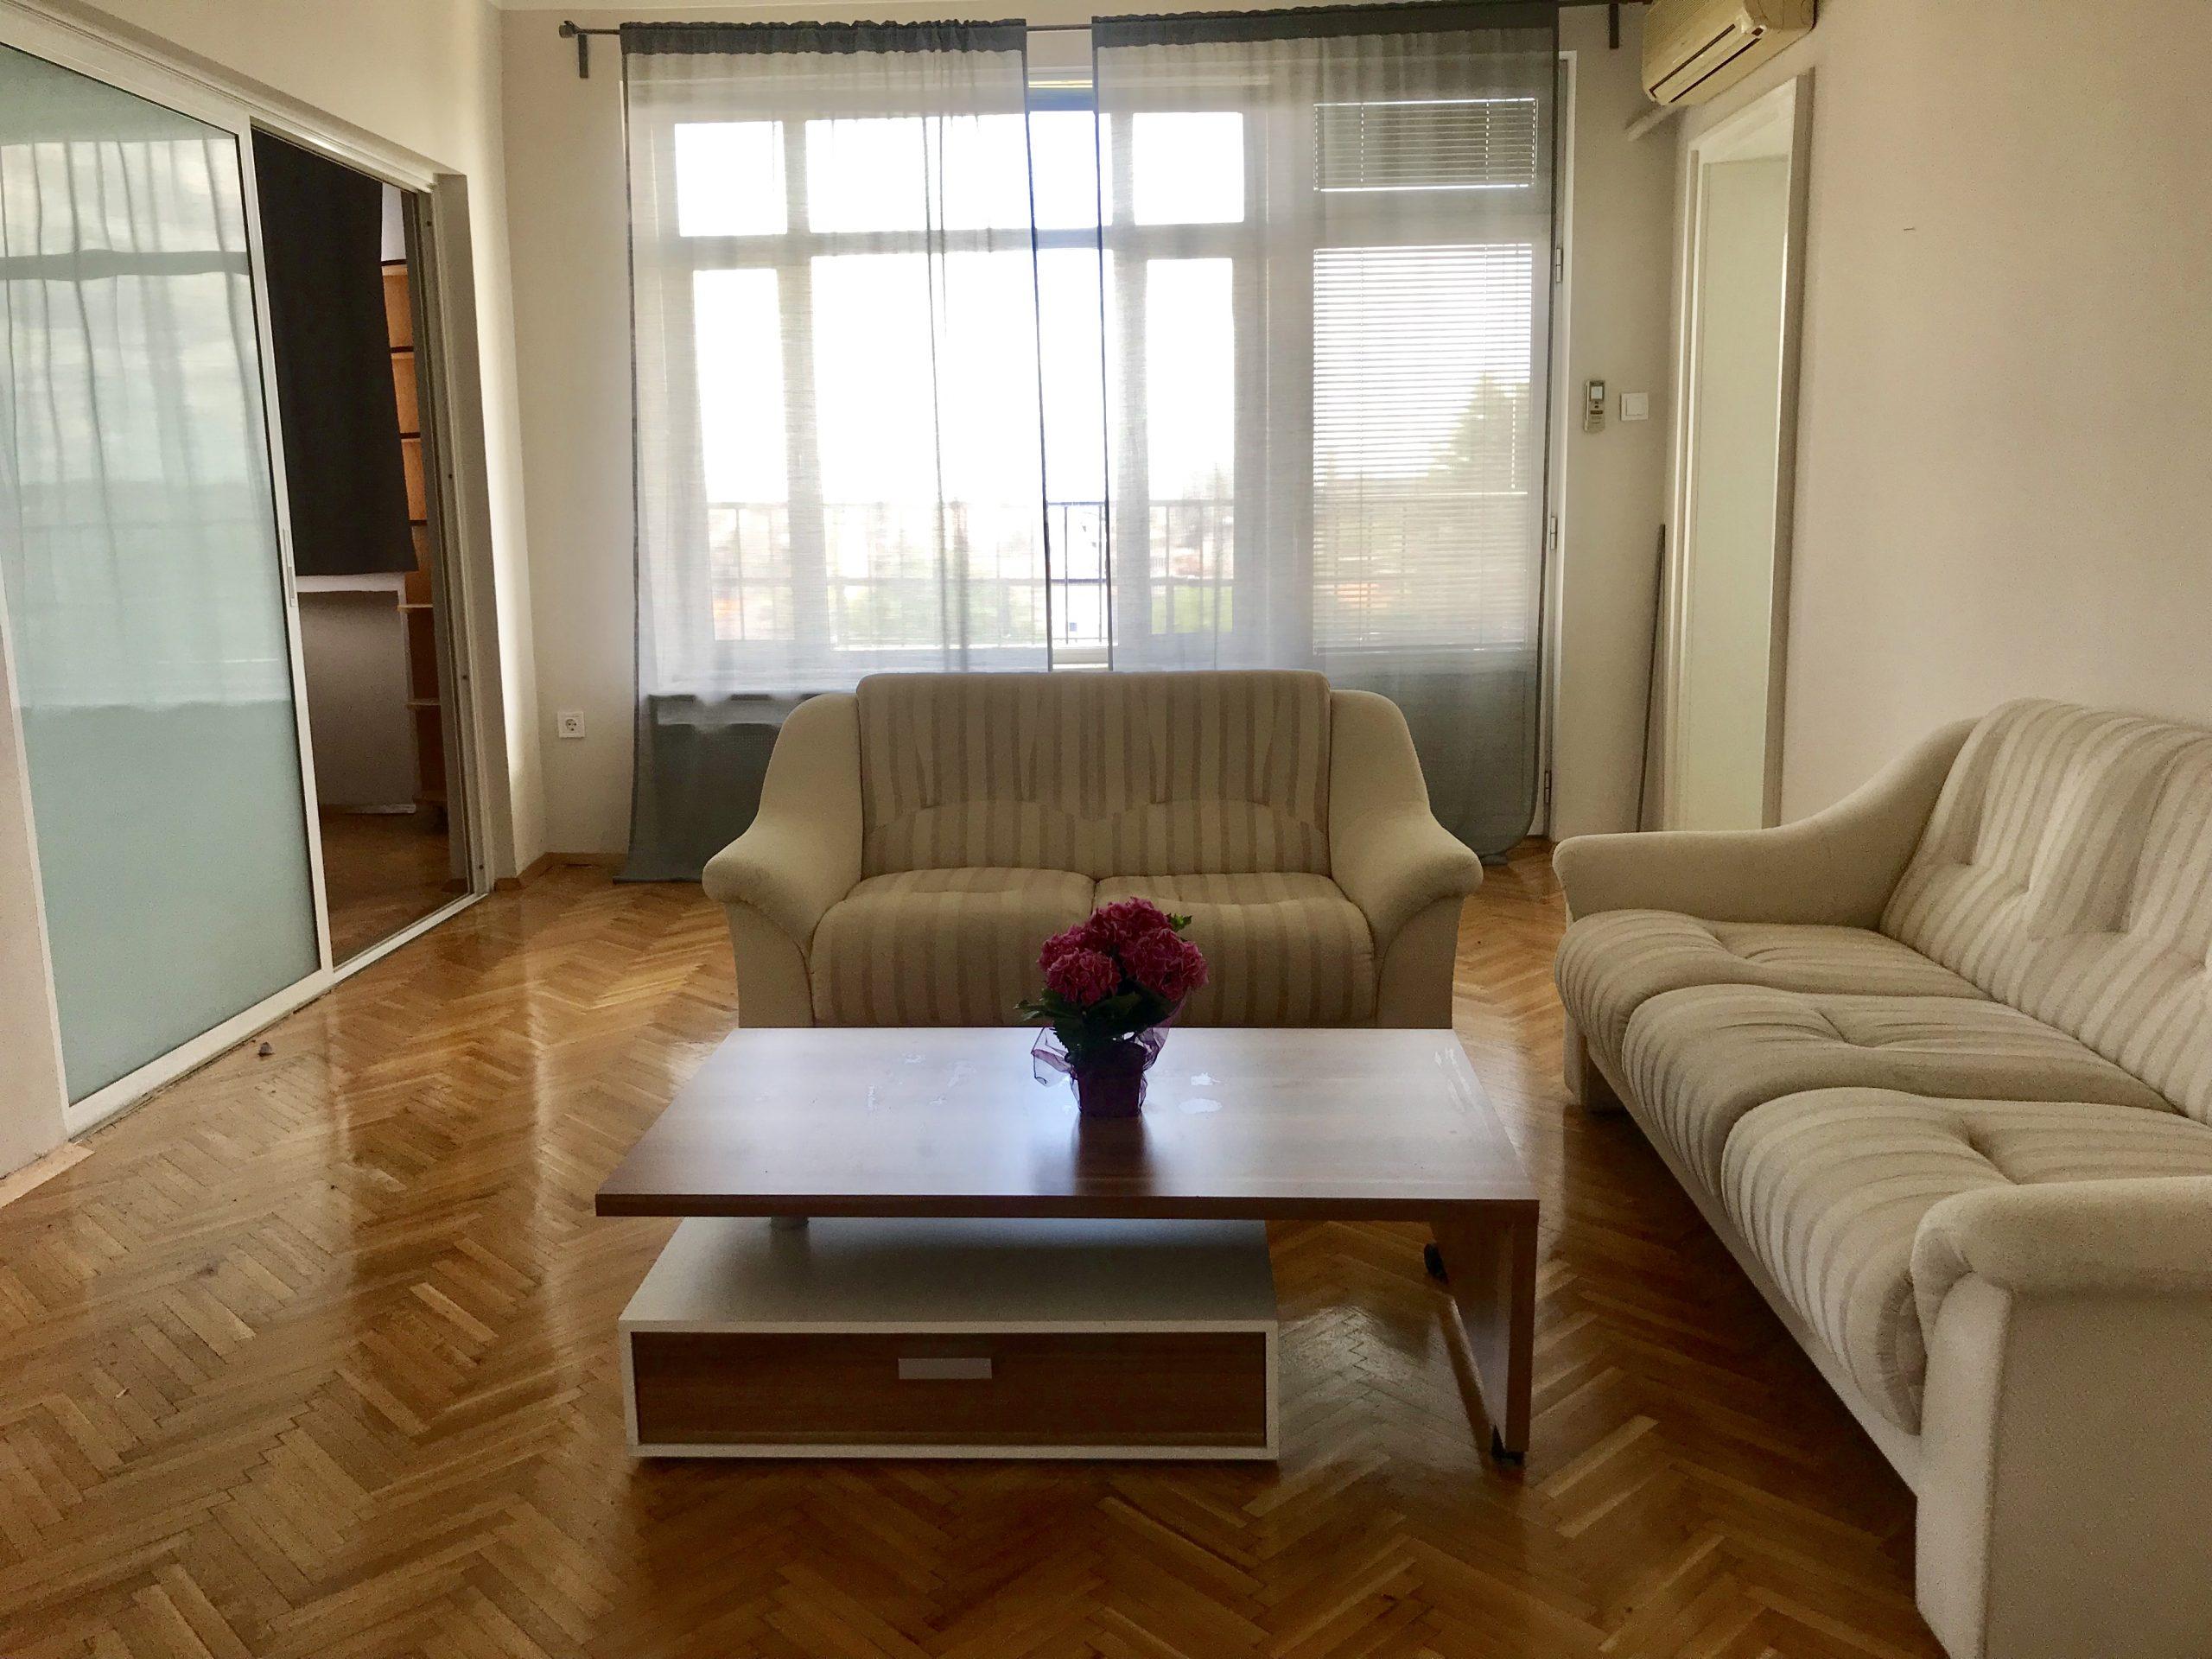 Тристаен апартамент под наем, до парк Заимов, гр. София